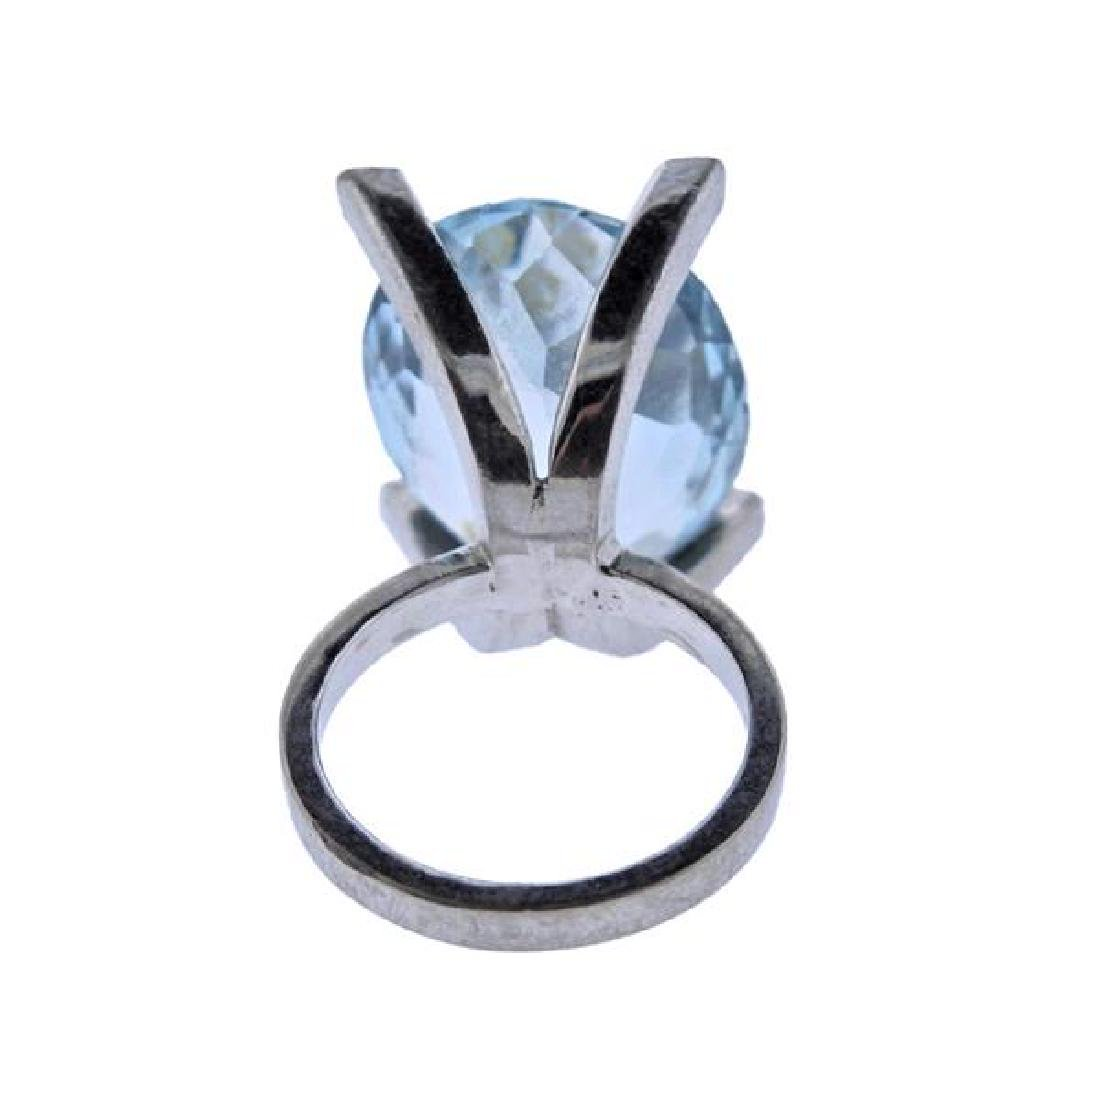 18K Gold 16.5ct Aquamarine Diamond Cocktail Ring - 3